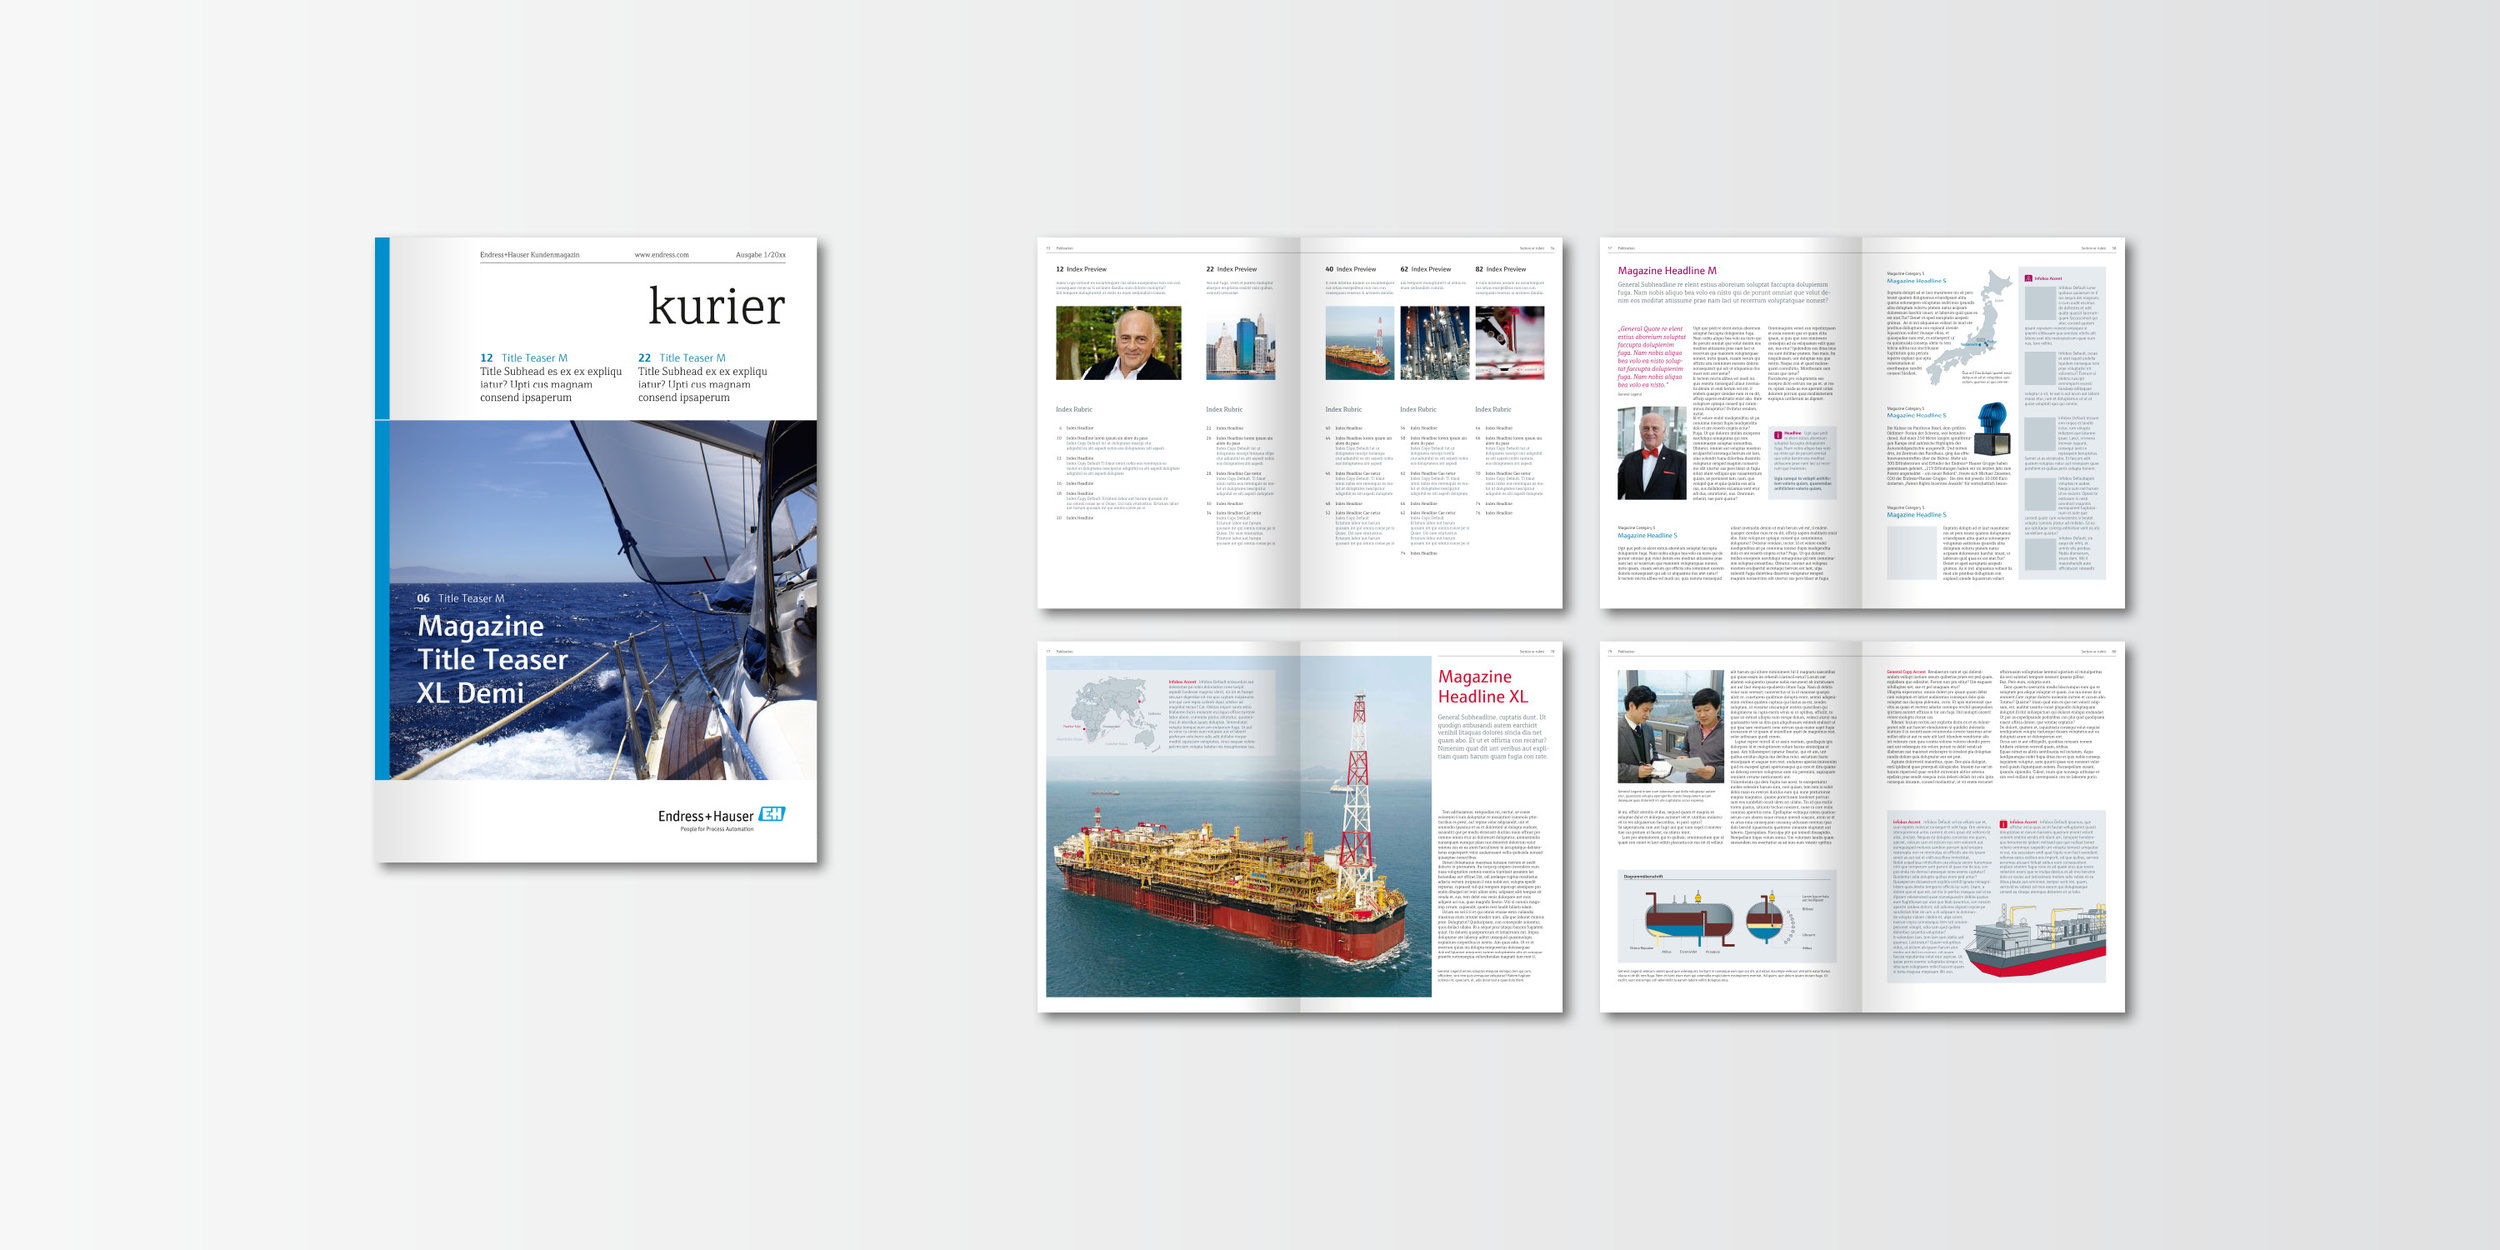 Endress+Hauser Corporate Design 06.jpg